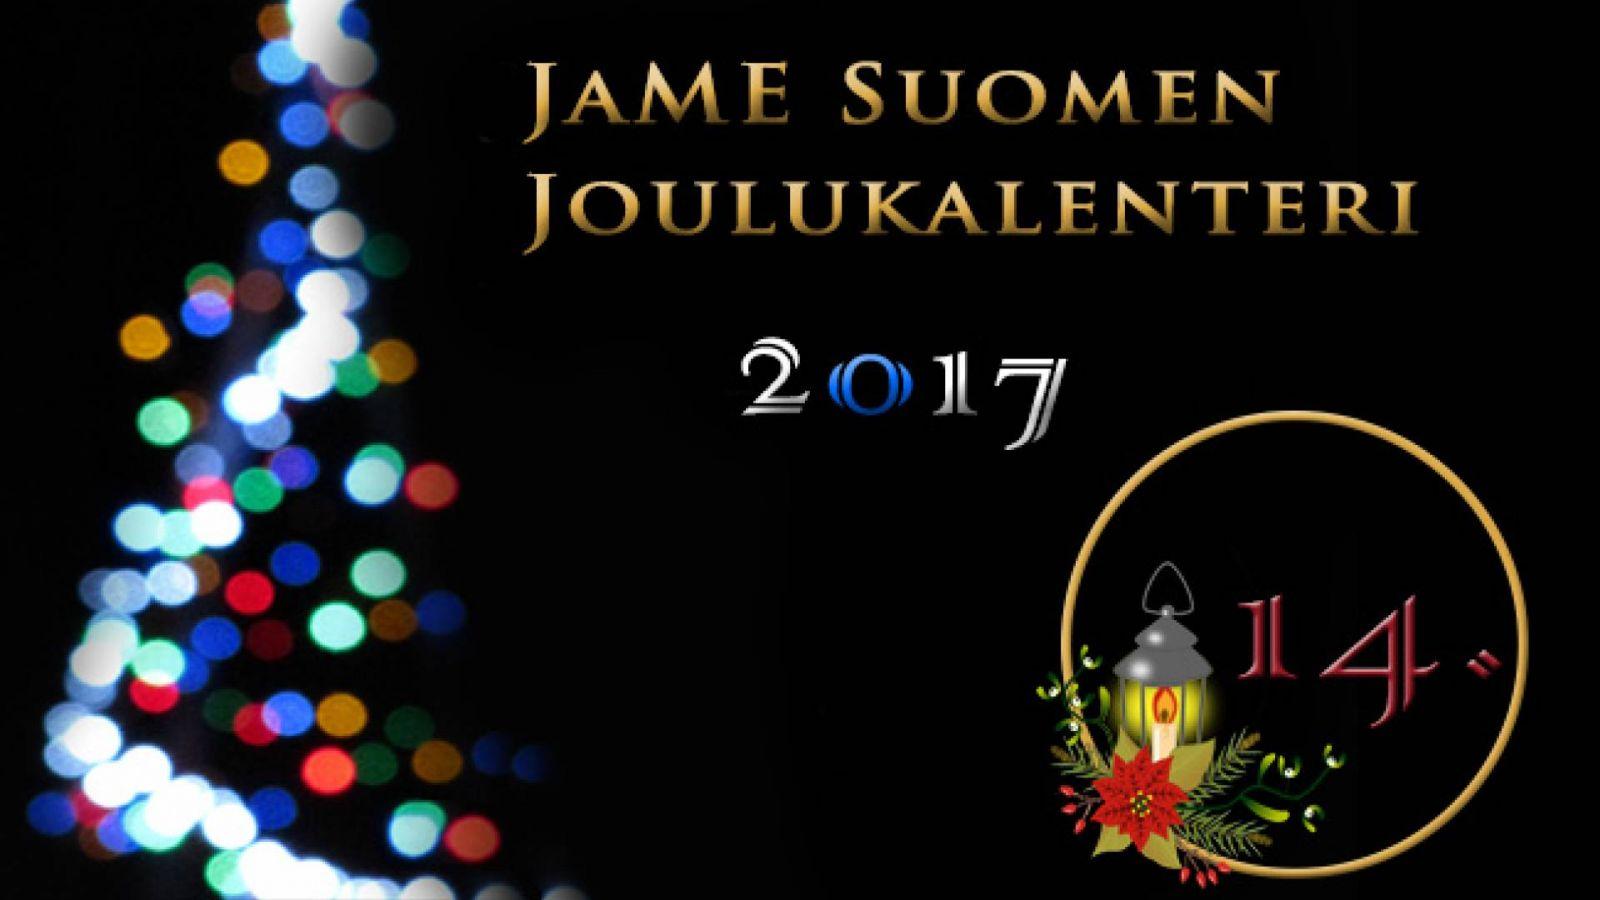 JaME Suomen joulukalenterin 14. luukku © Nipsu